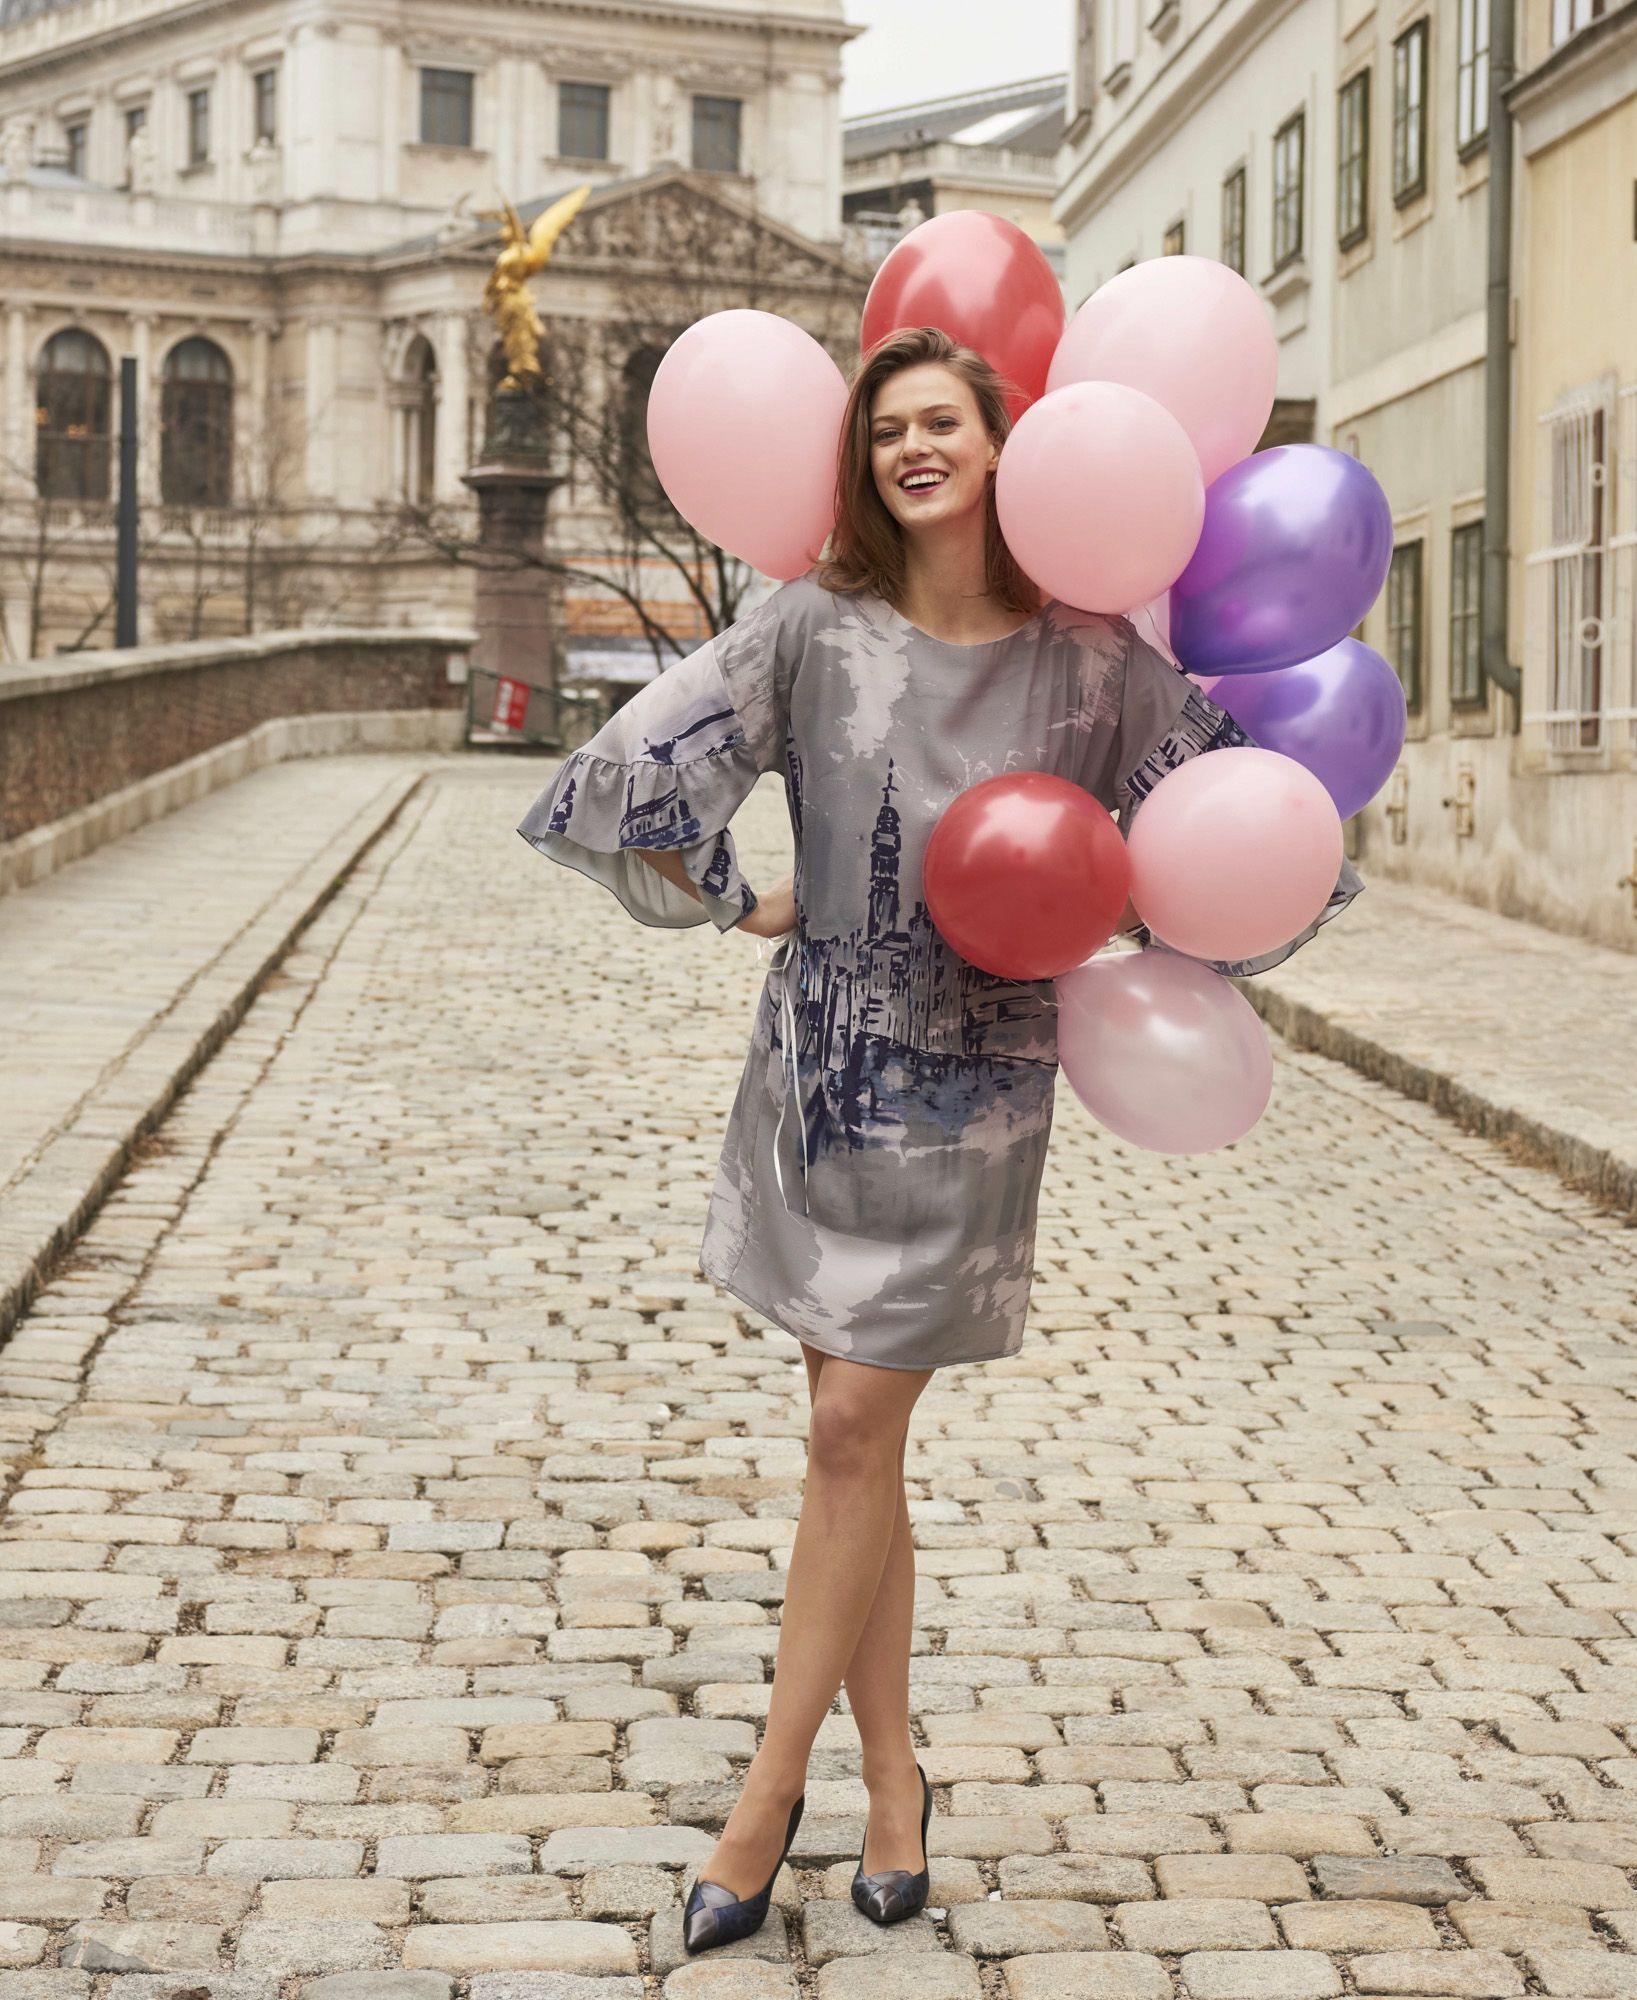 Kleid mit Volant   W50-2018-Bekleidung   Pinterest   Shopping and Online  shopping 845228149e